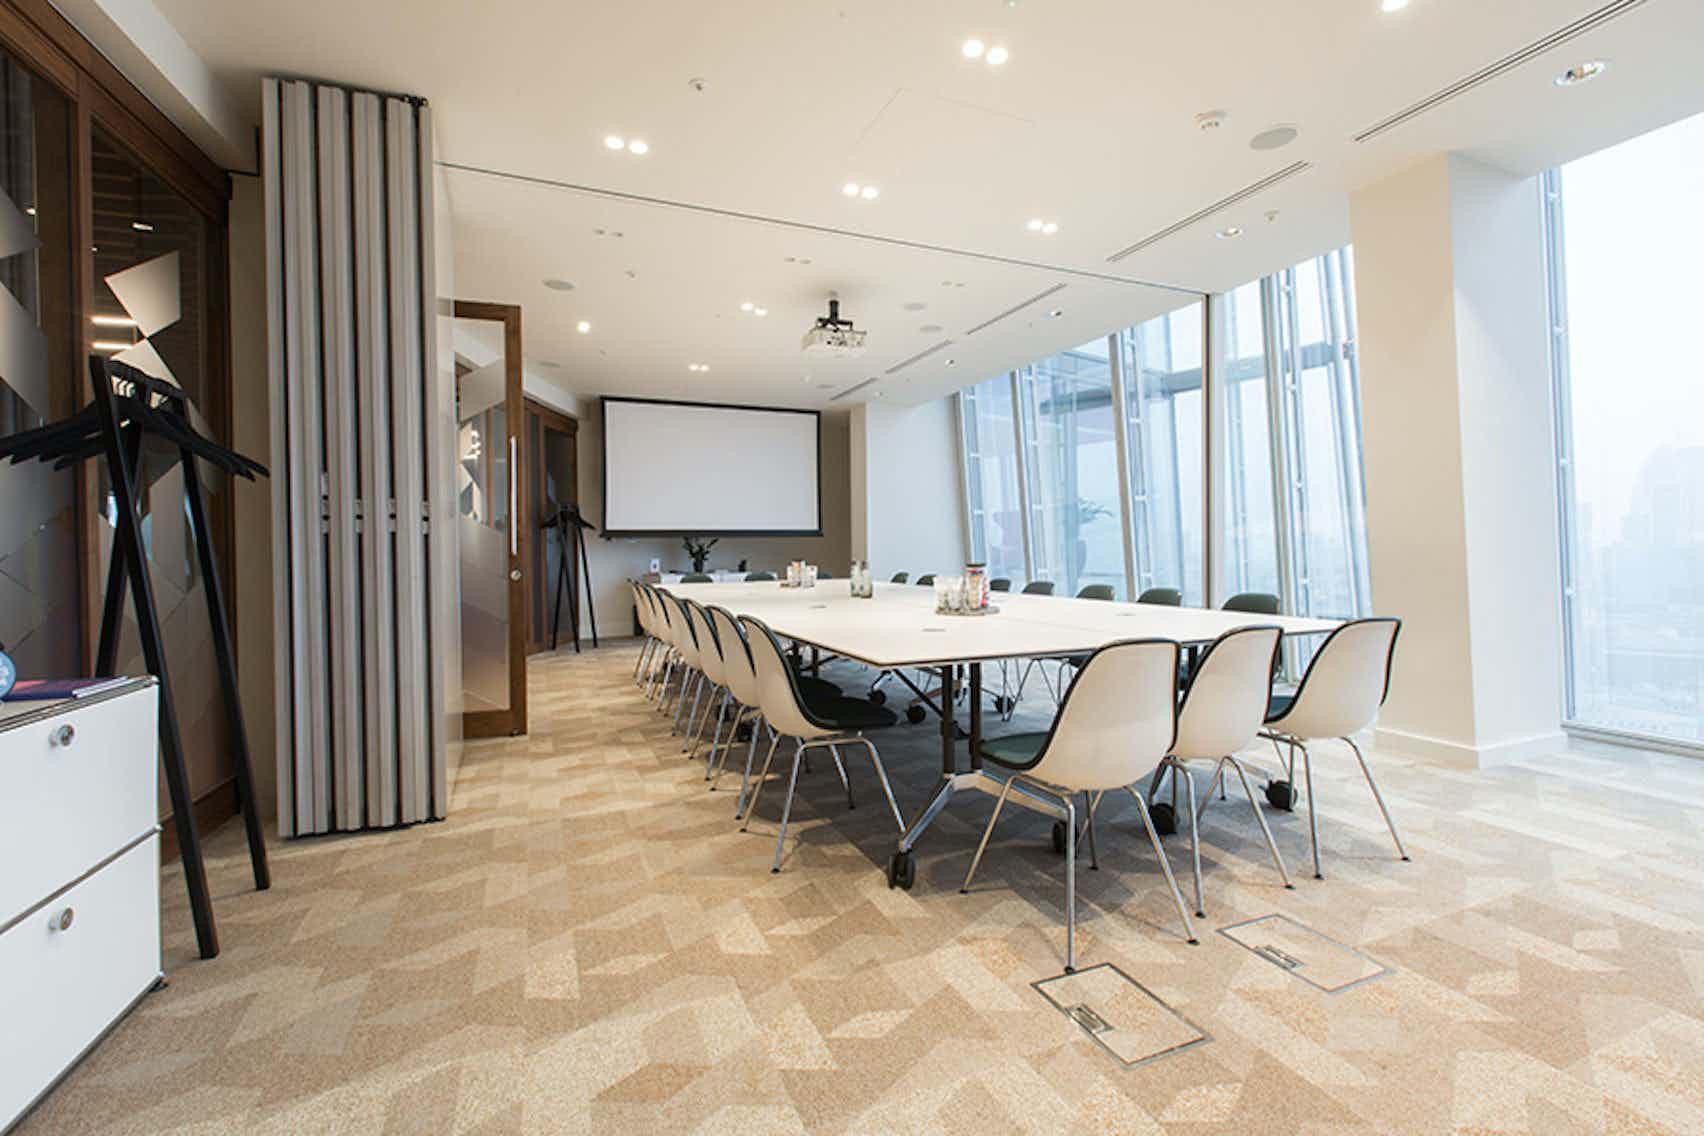 Meeting Room 1 & 2 , TOG, 24/25 The Shard